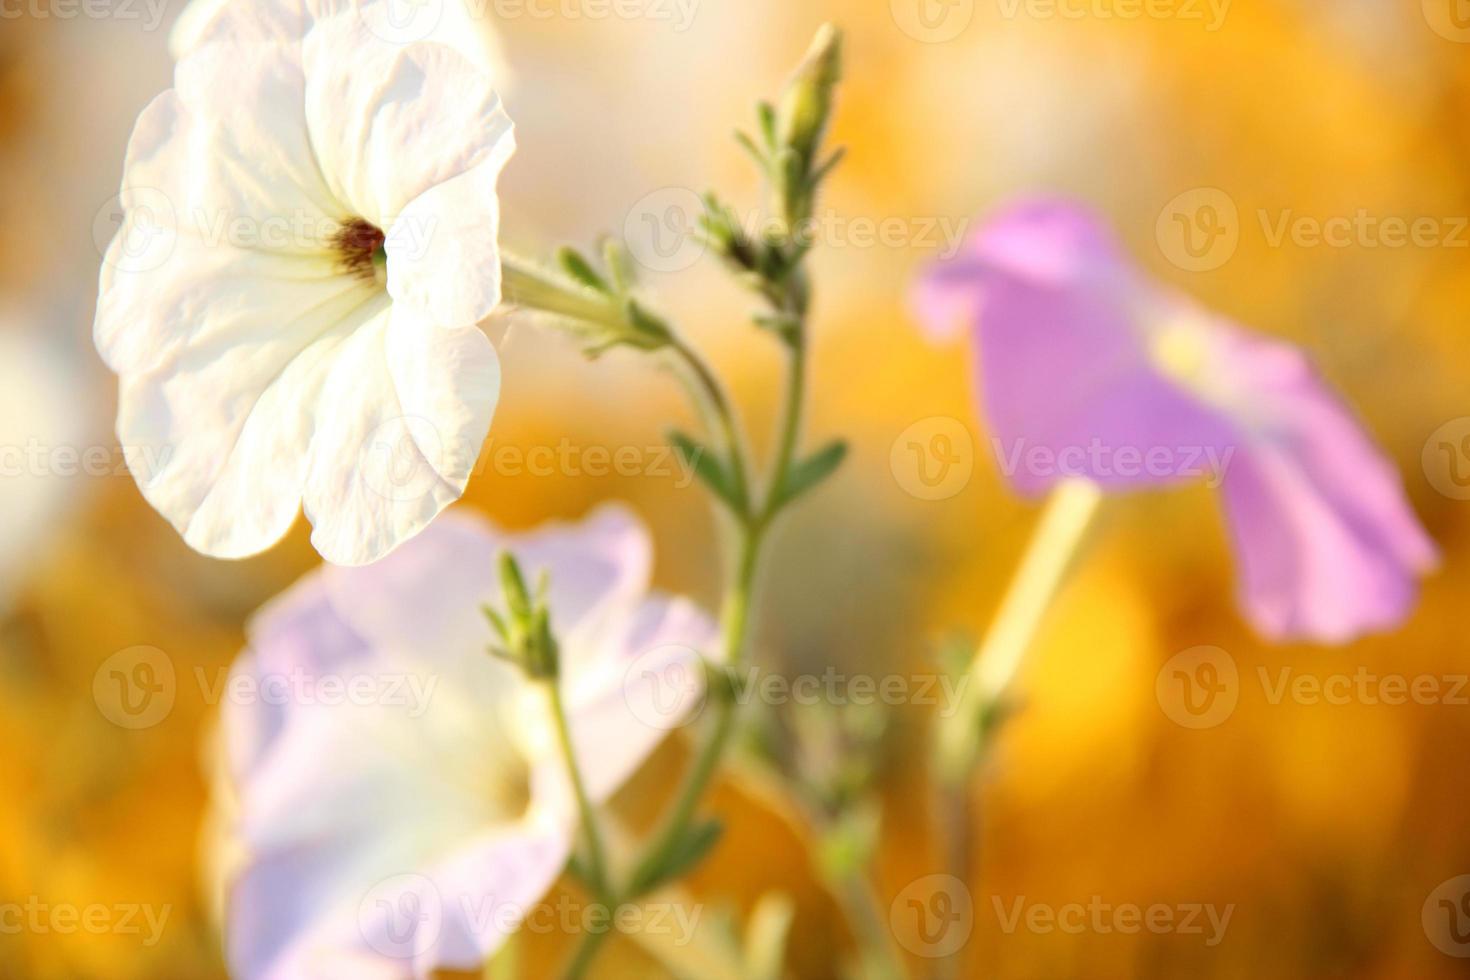 petunia pittoresk 1 foto